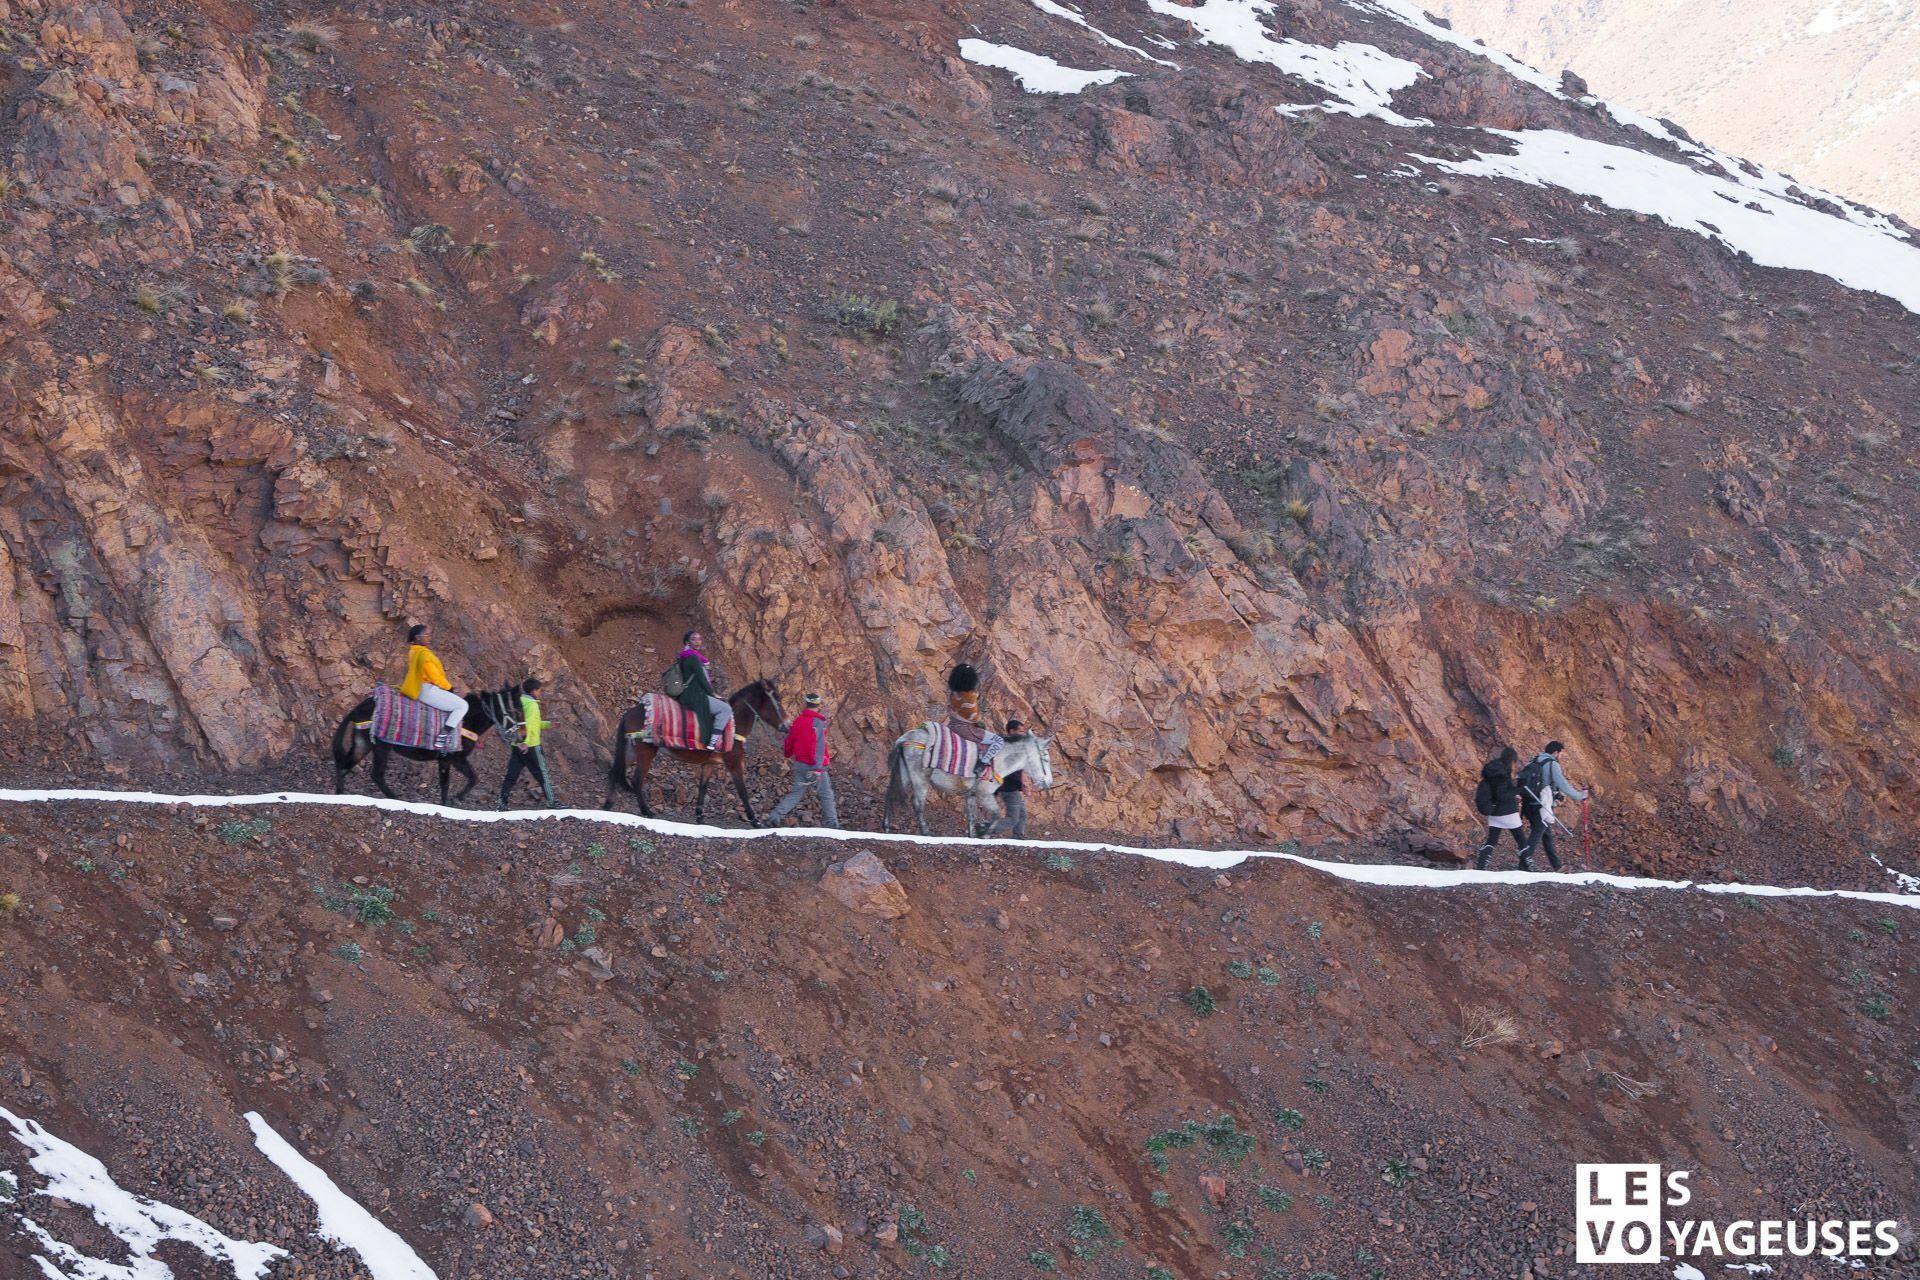 Les-voyageuses-maroc-imlil-hiver-00059